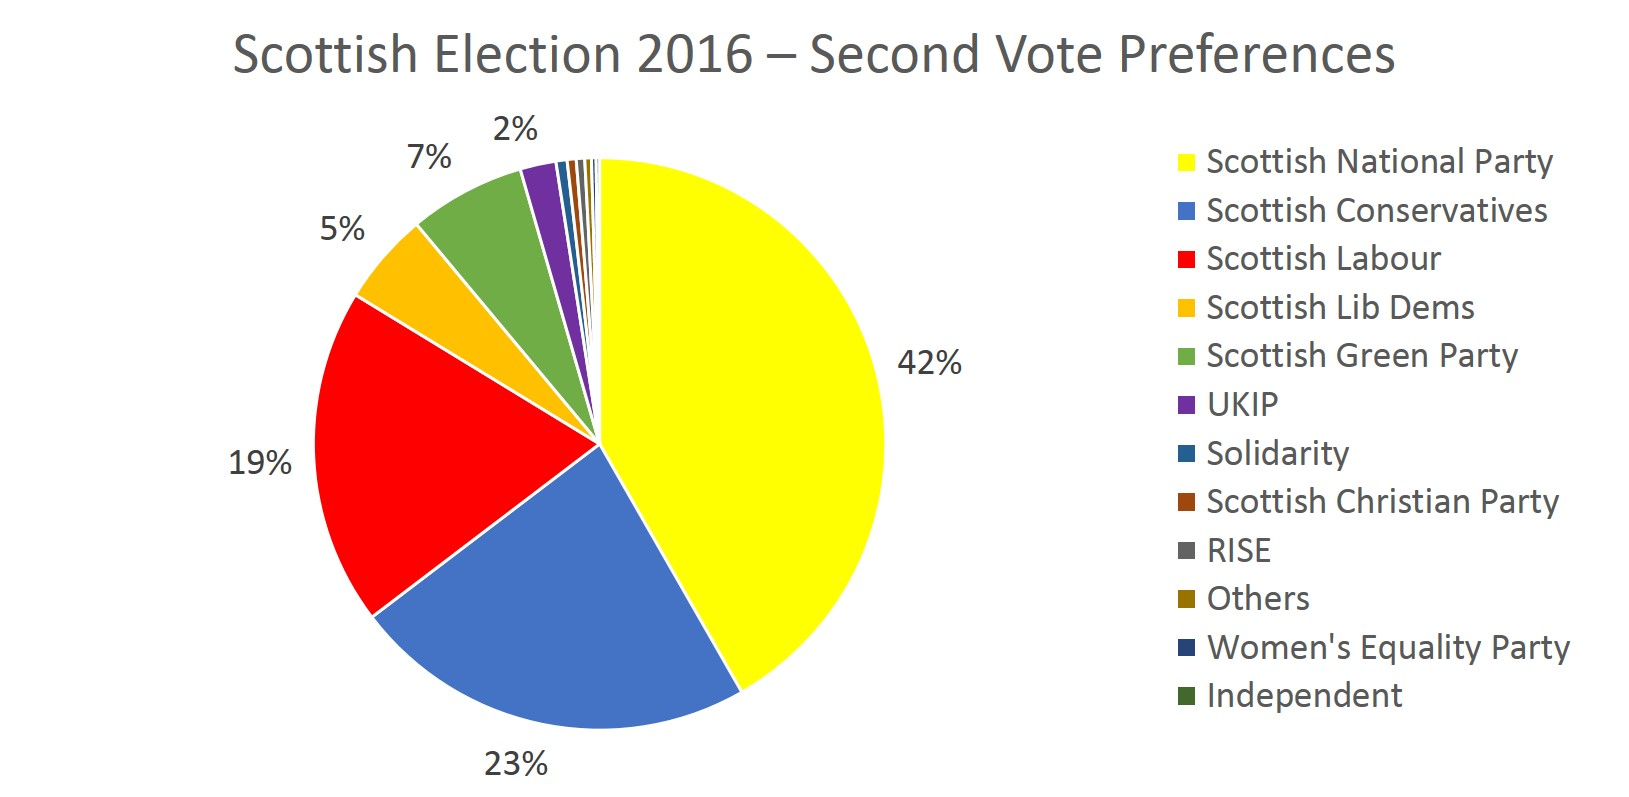 Scottish Election 2016 Second Vote Preferences